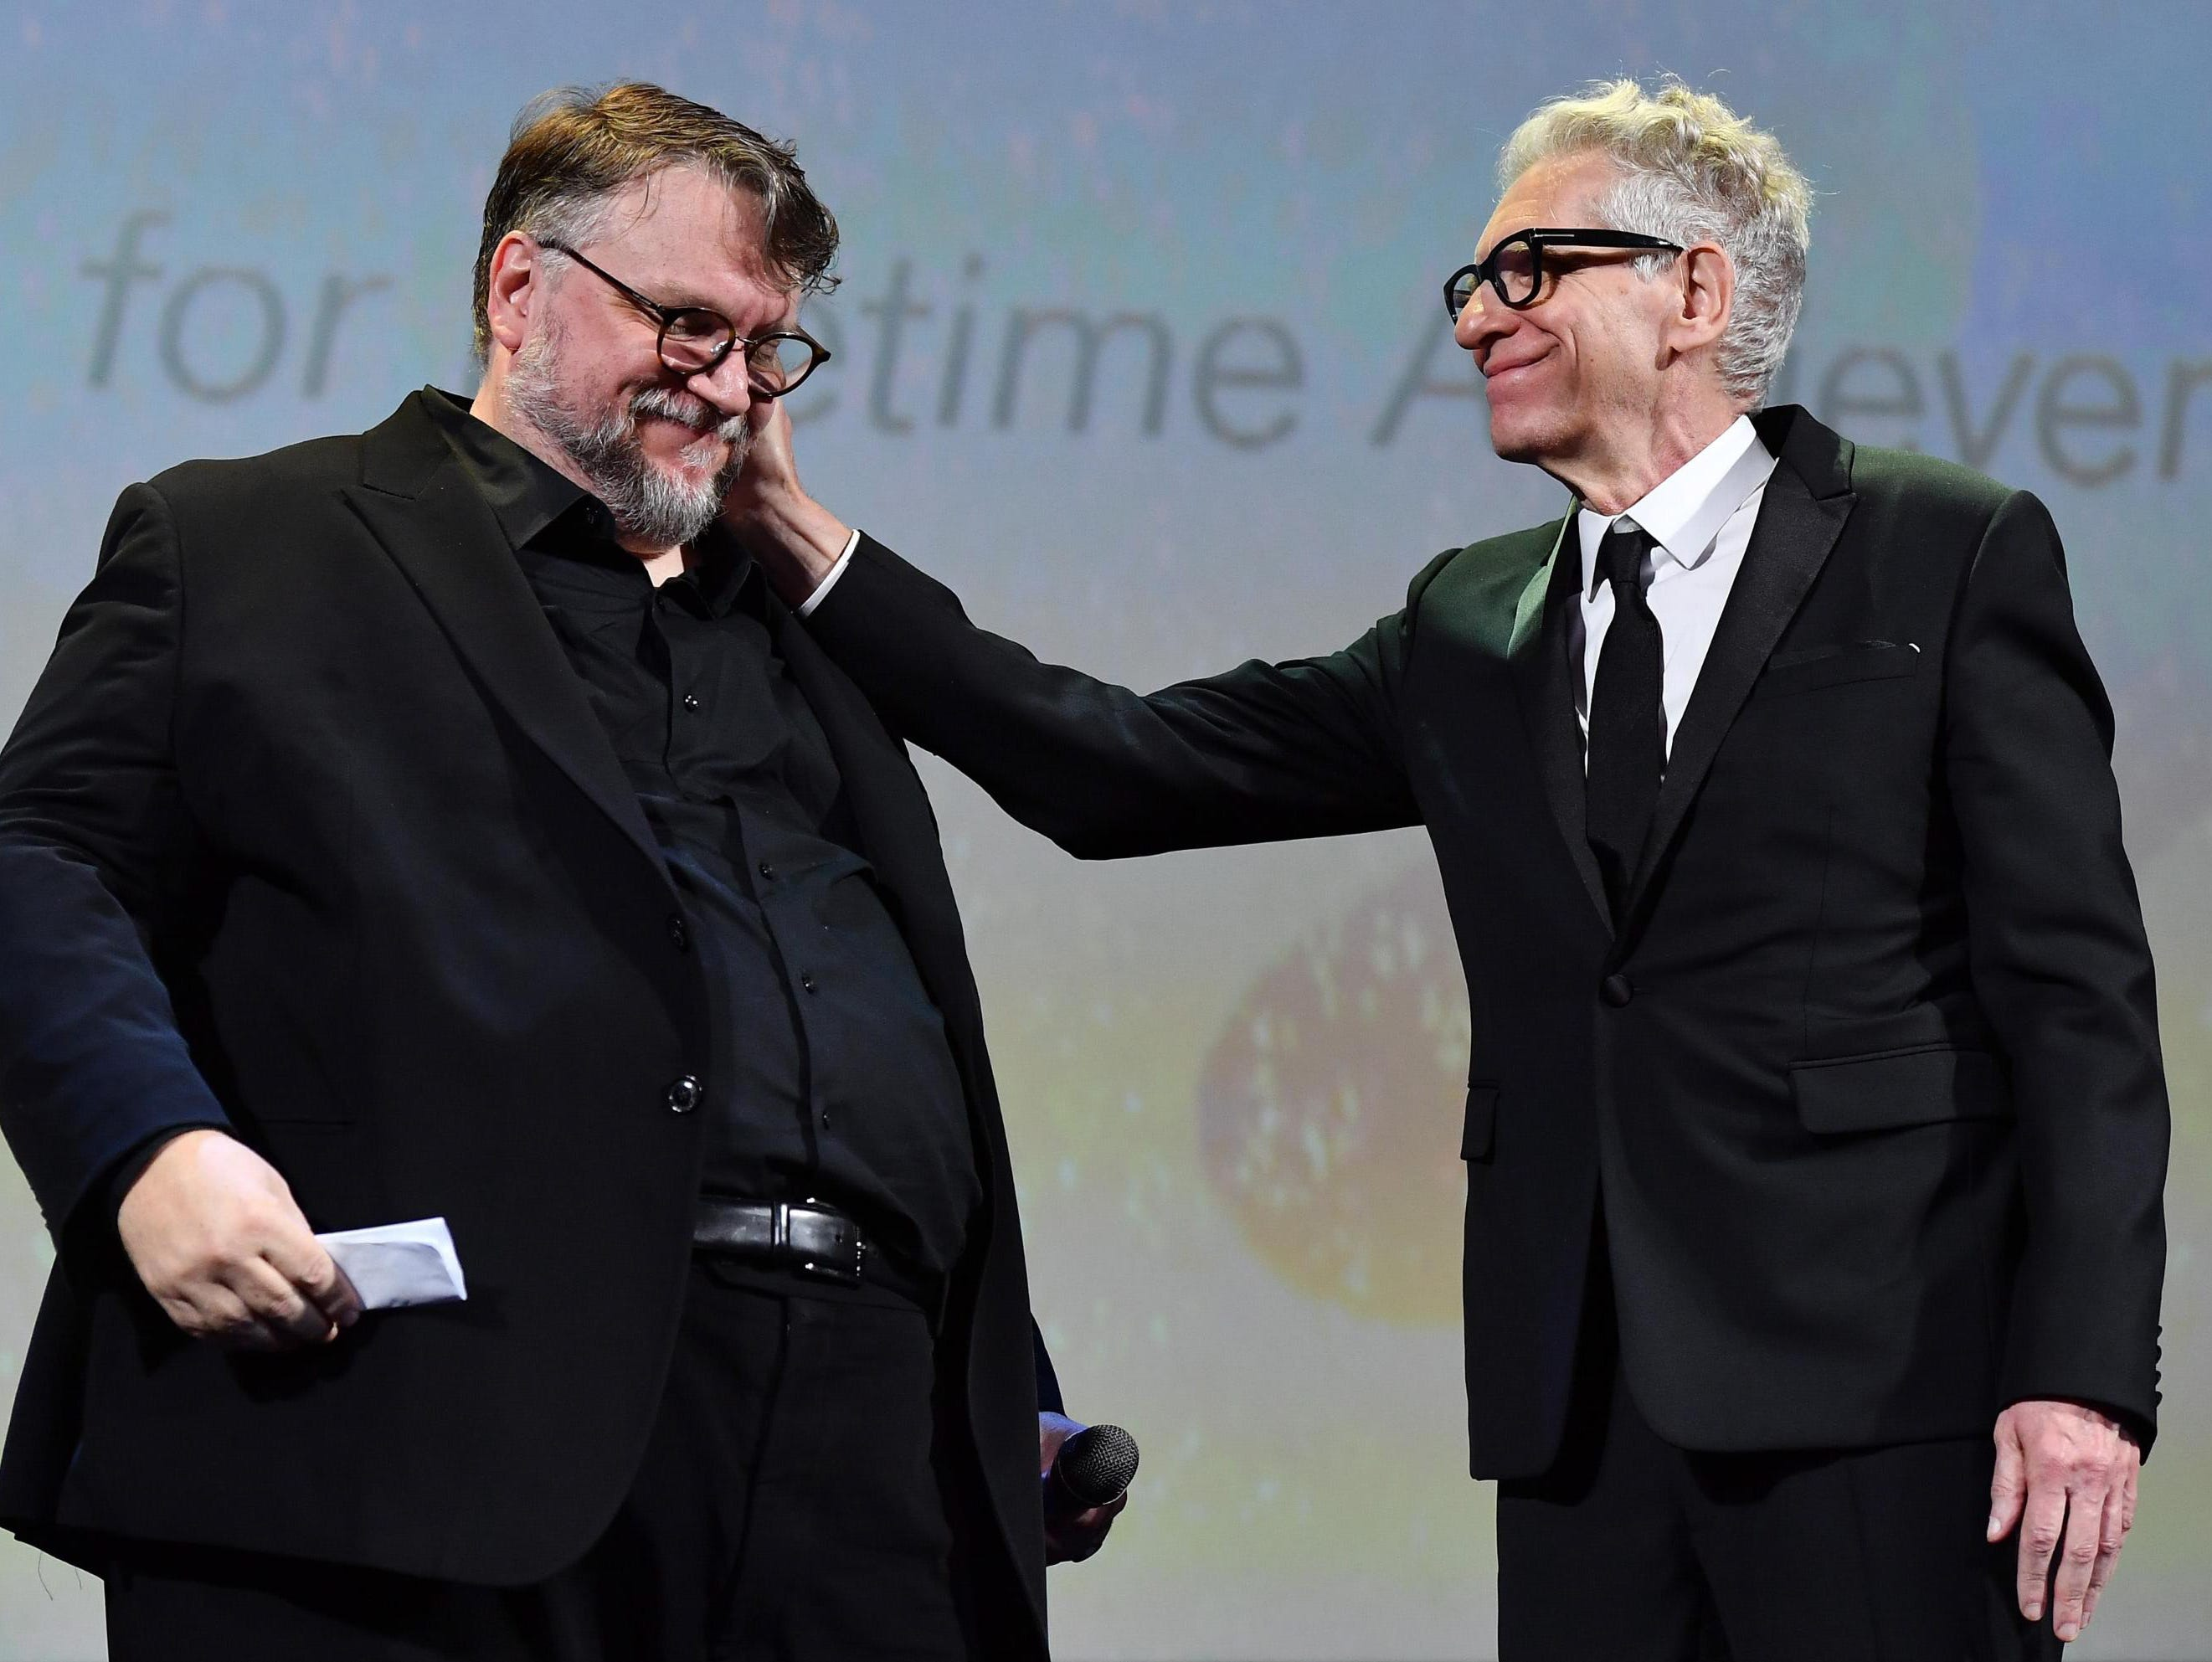 Filmmaker David Cronenberg and director Guillermo del Toro (L, president of the Venice Film Festival jury) after Cronenberg received the Golden Lion for Lifetime Achievement Award.